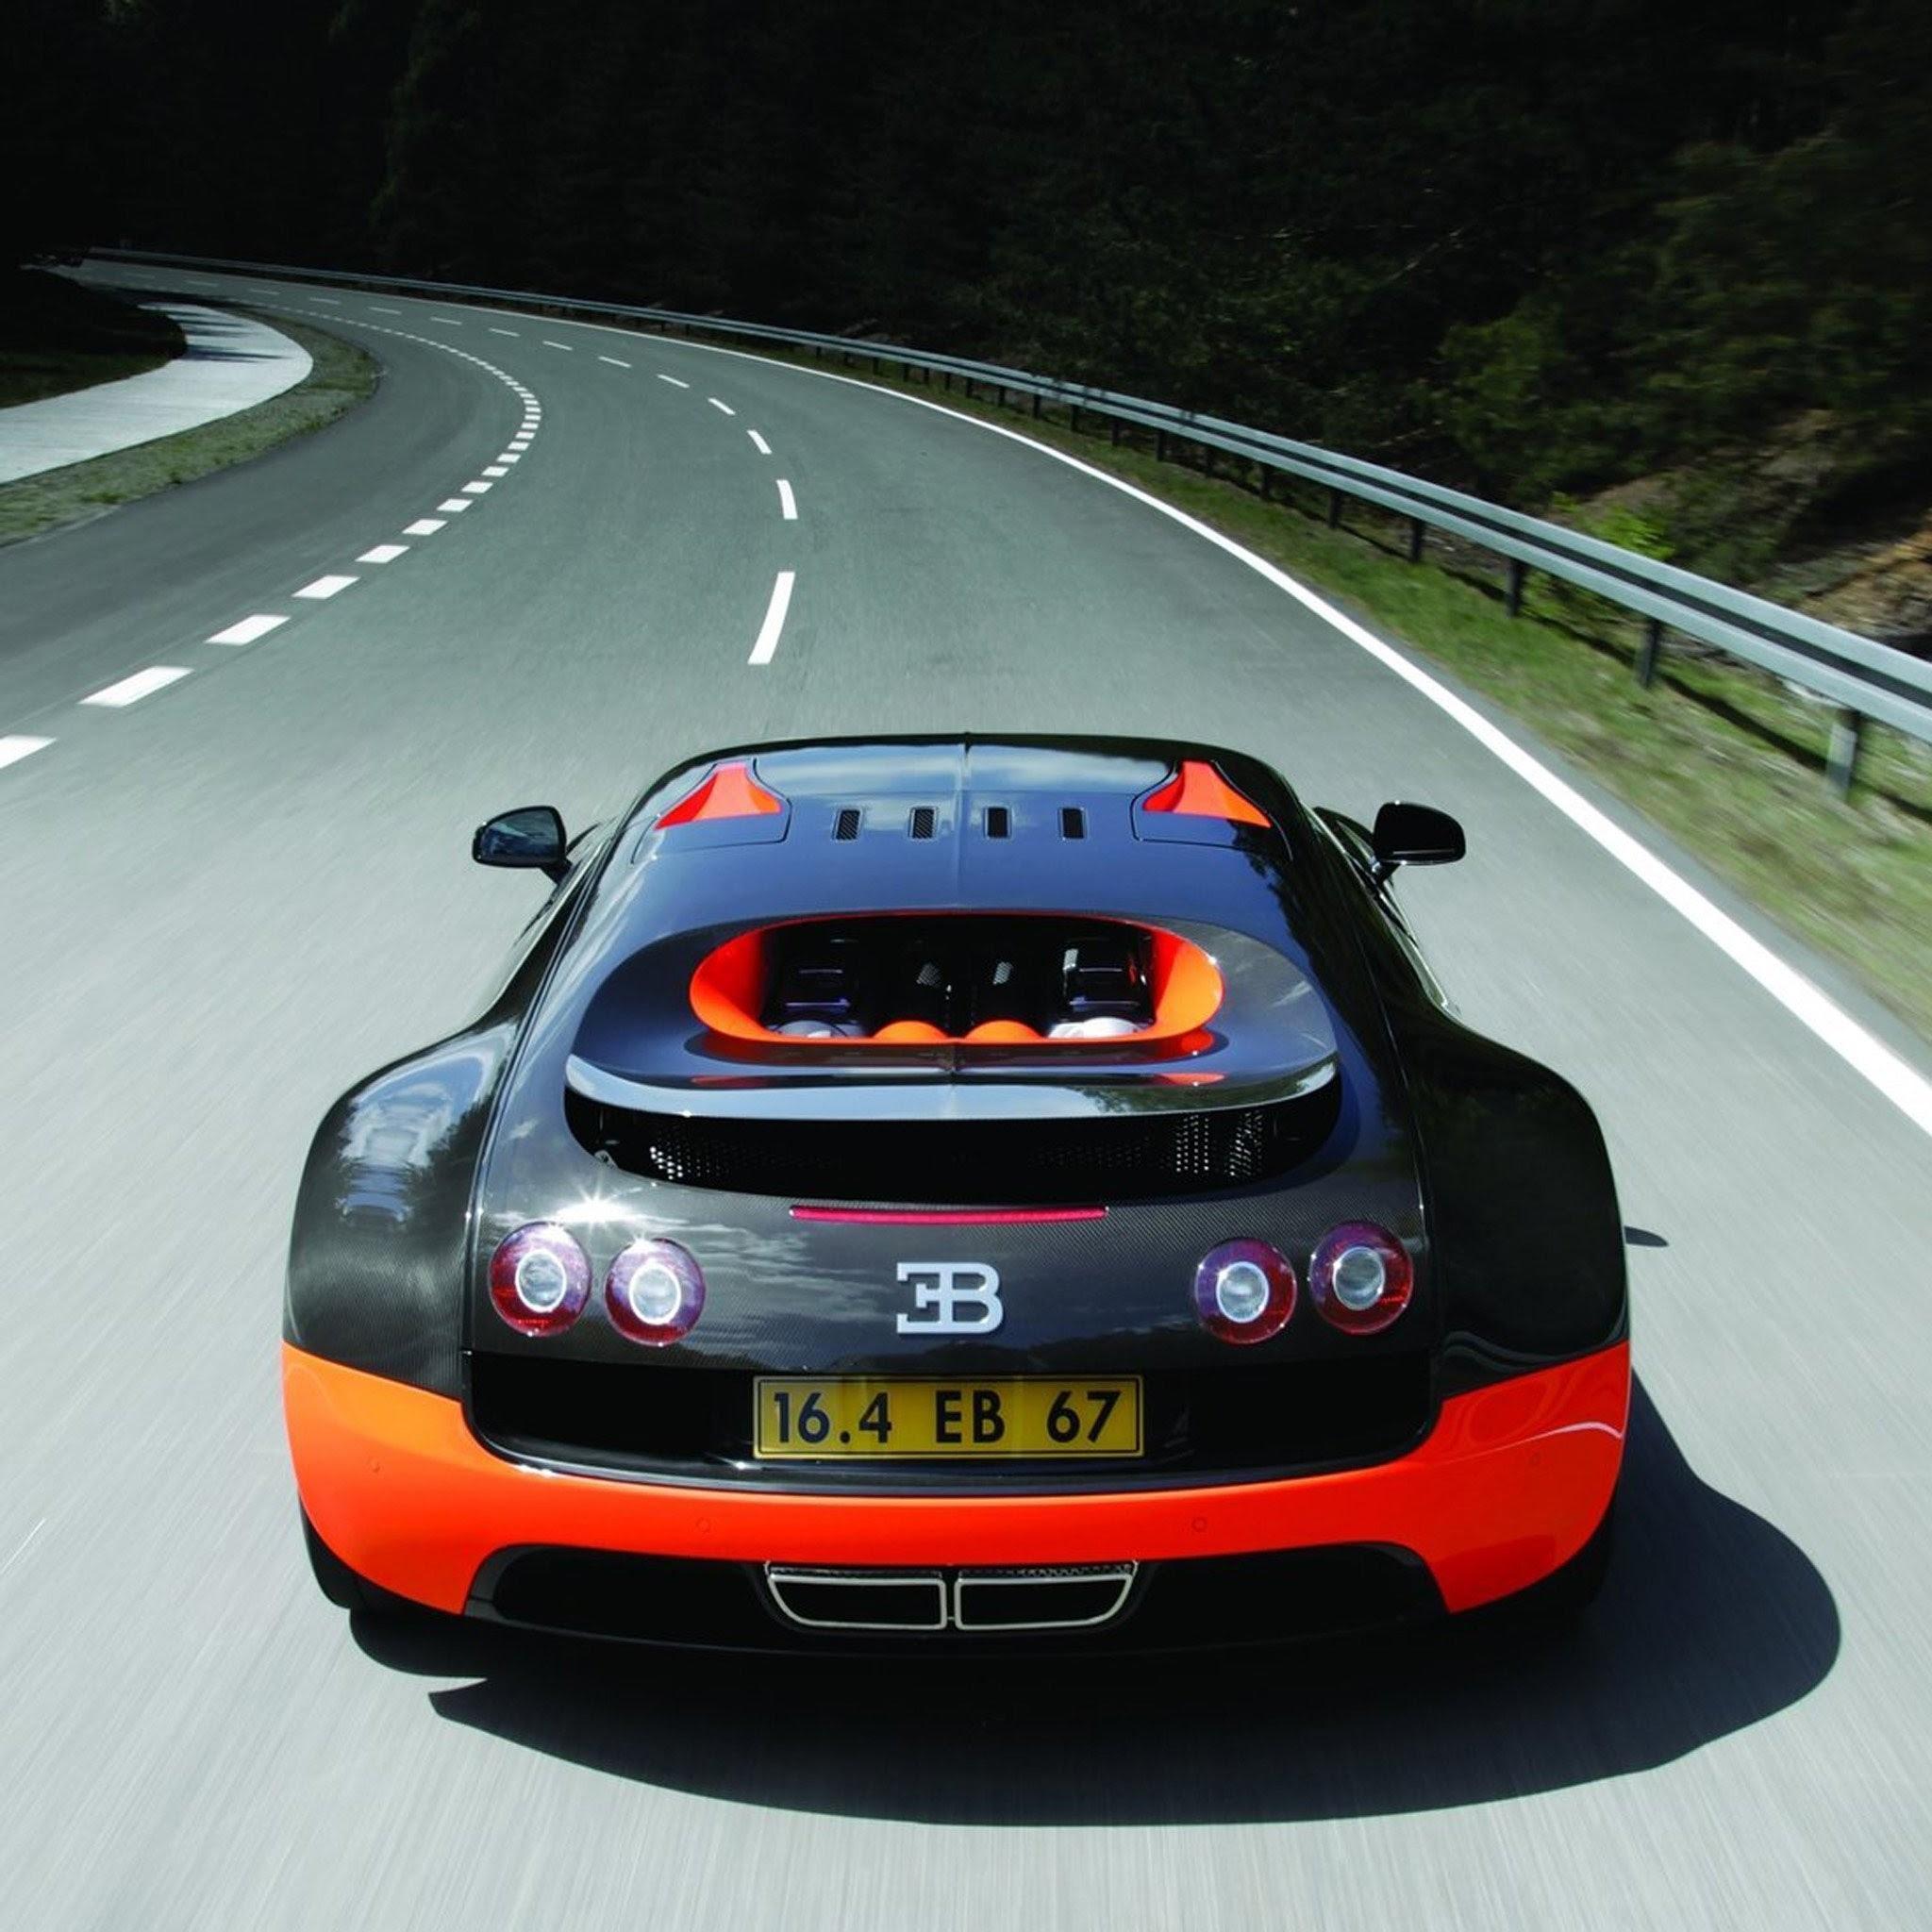 Green Bugatti Veyron Wallpaper 71 Images